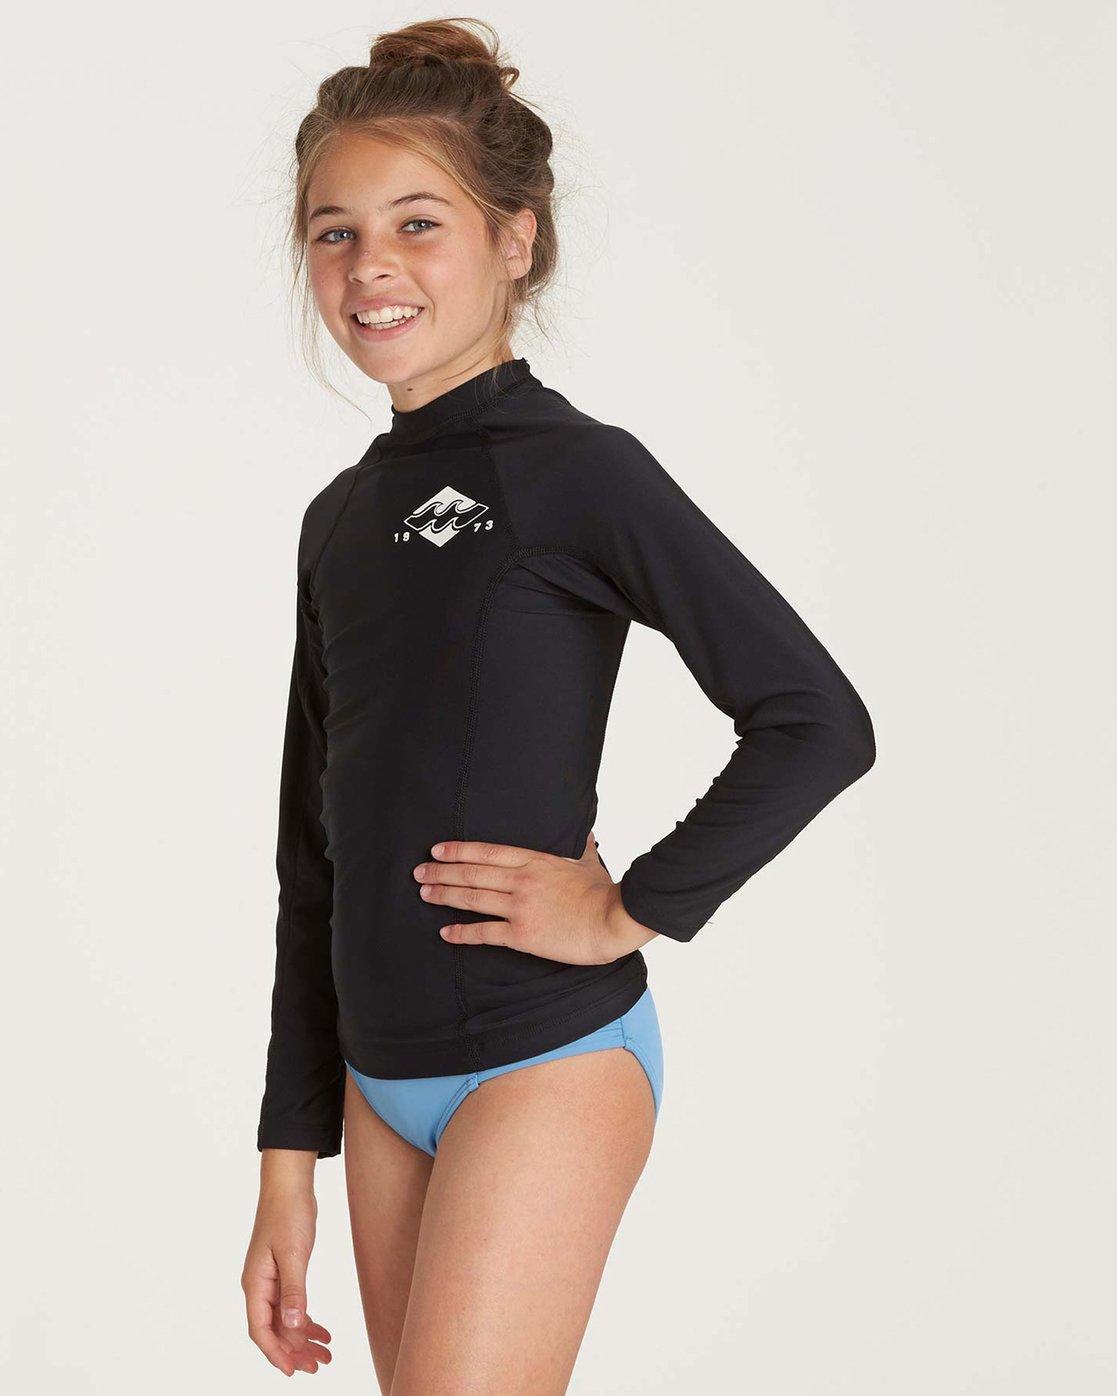 58ce03e22c81 1 Girls' Surf Dayz Performance Long Sleeve Rashguard Black GR51NBSD  Billabong